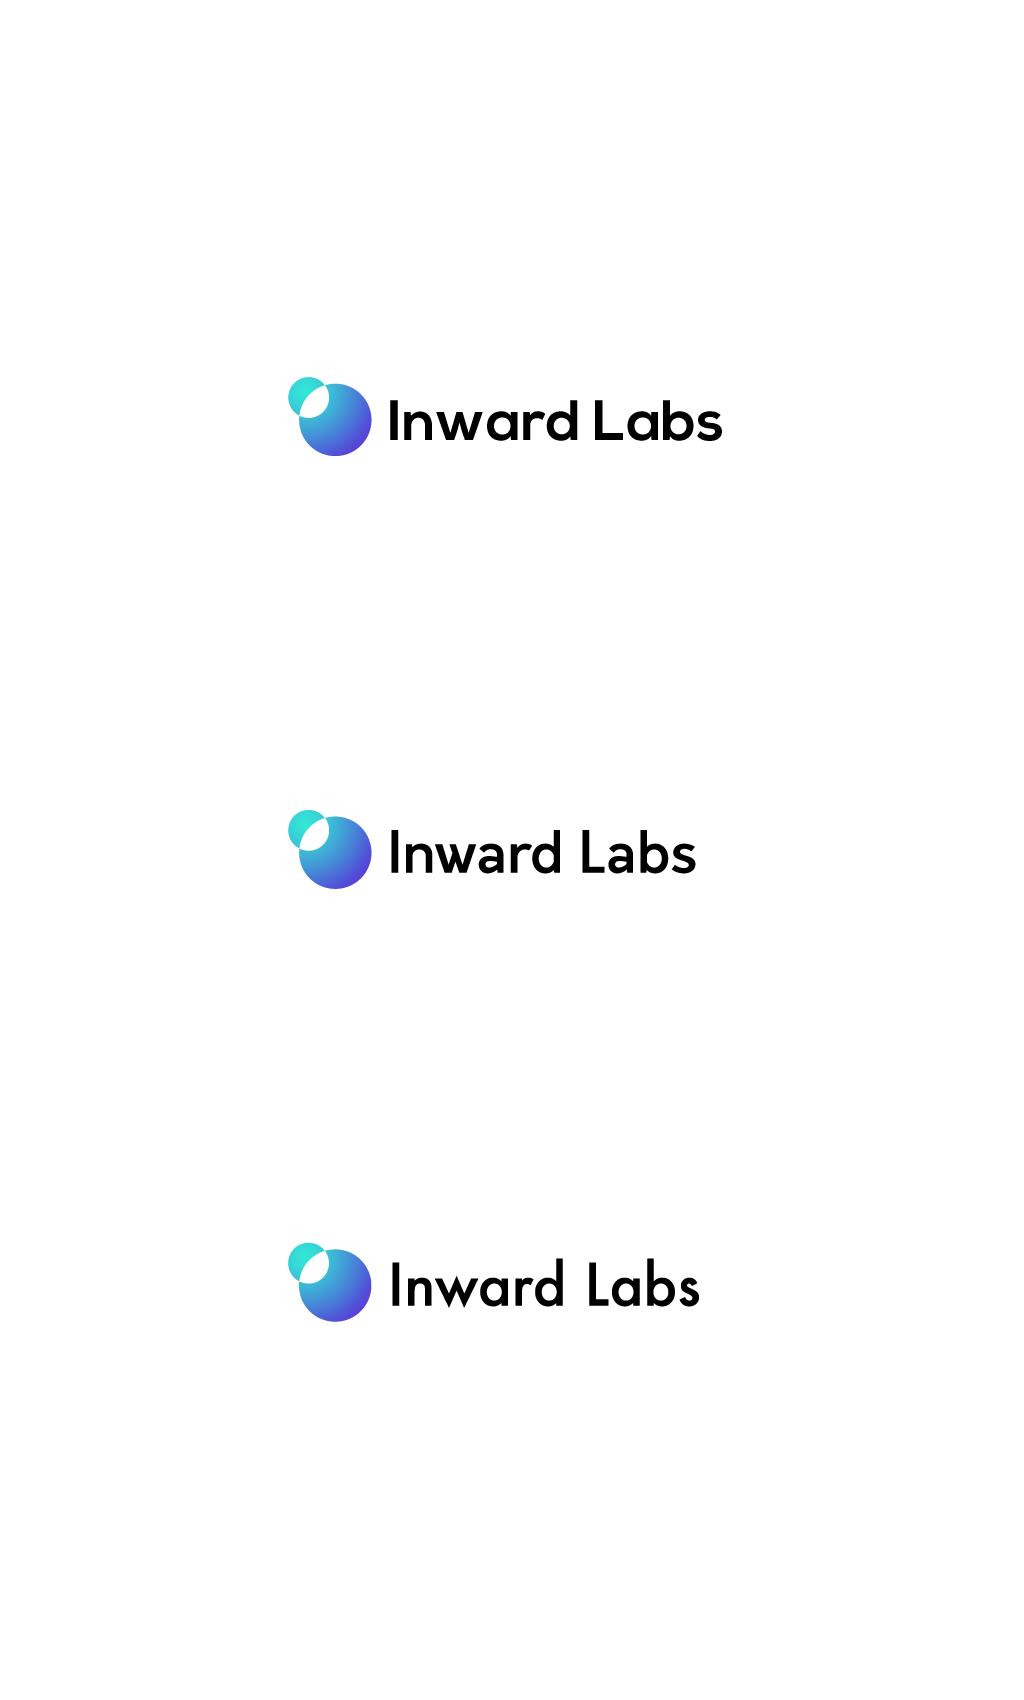 Company Logo for App Company Producing #1 Hit Apps